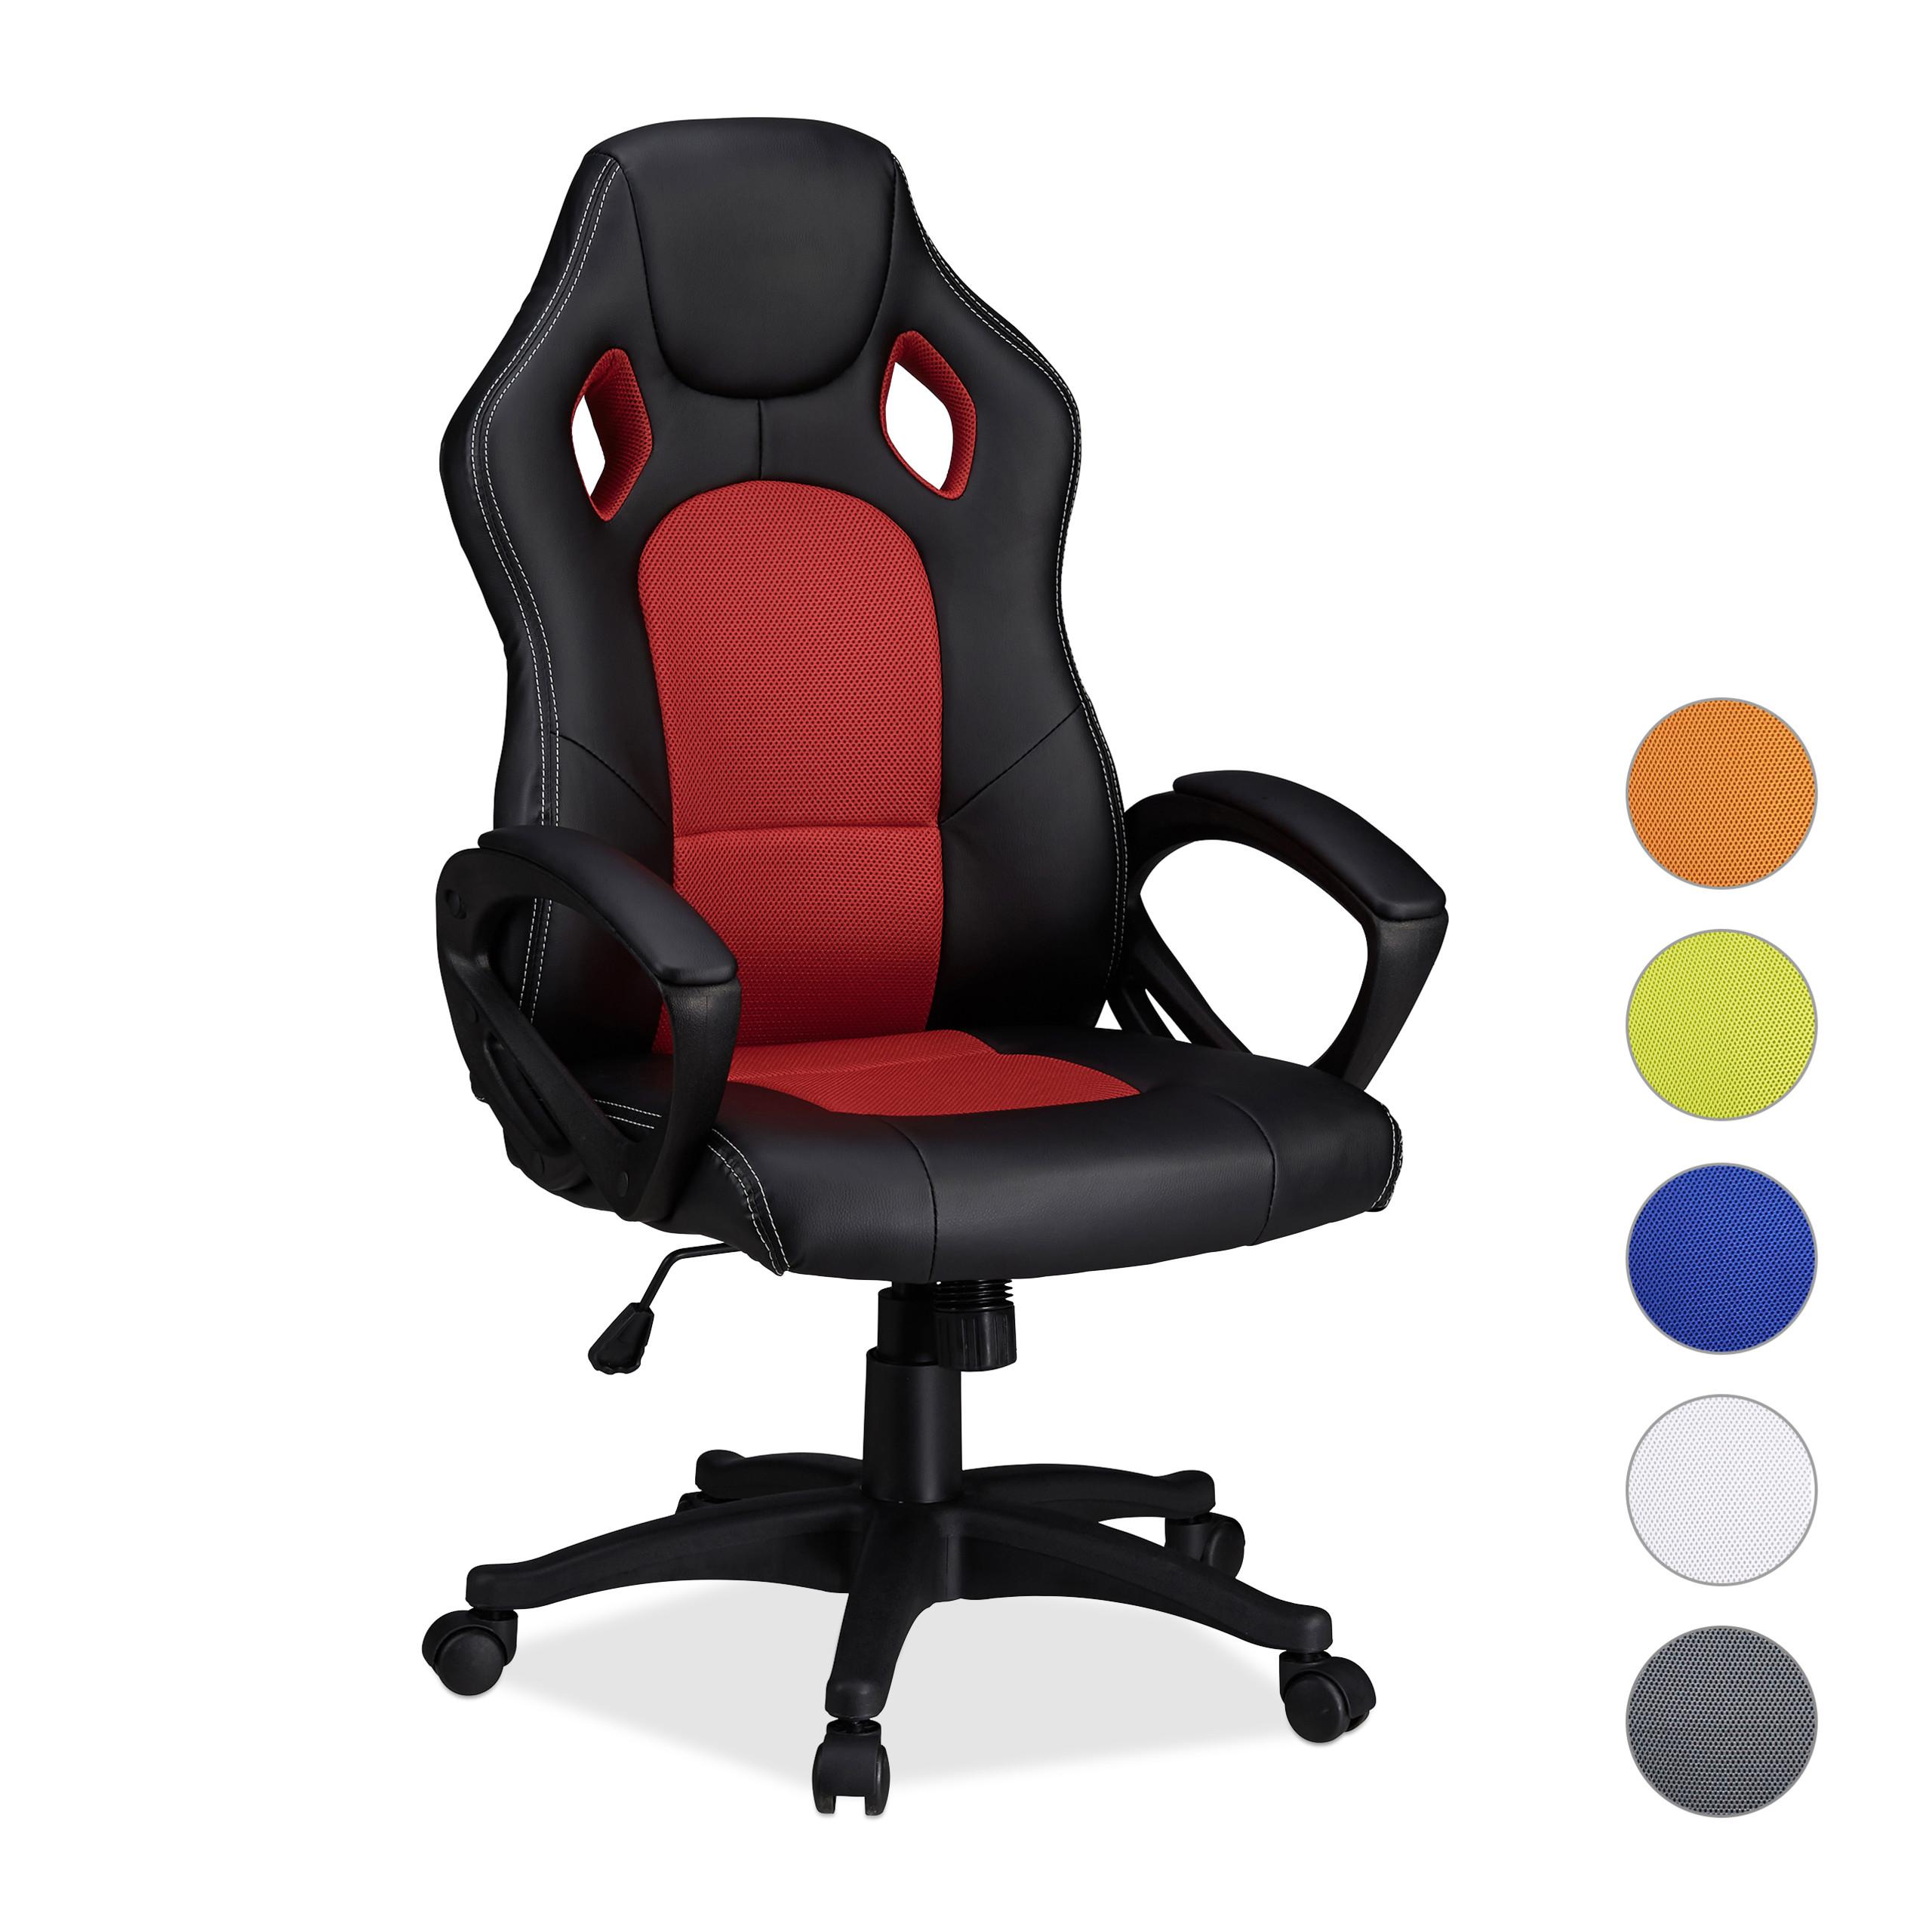 Gaming stoel XR9 PC gamestoel gamer bureaustoel belastbare Racing stoel